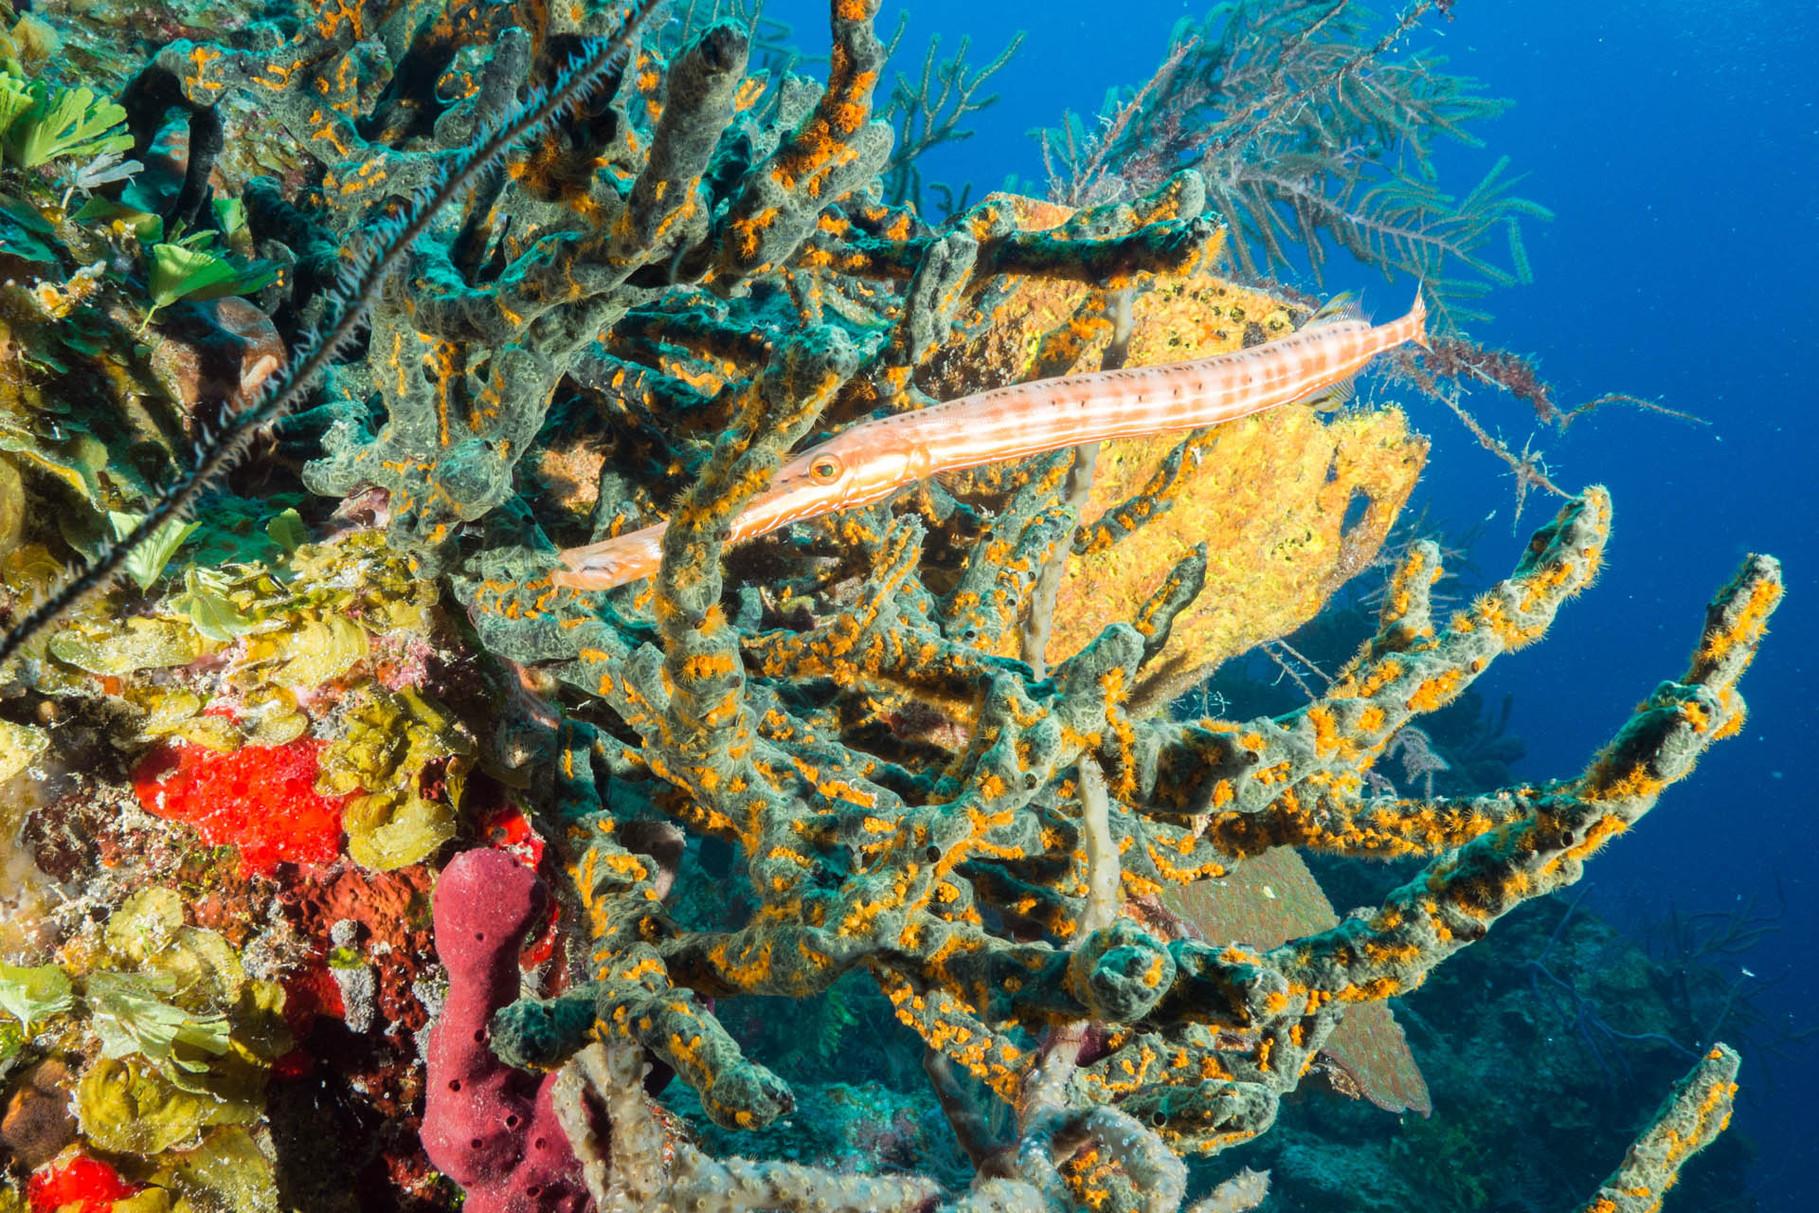 Trumpetfish [Bahams, 2014]